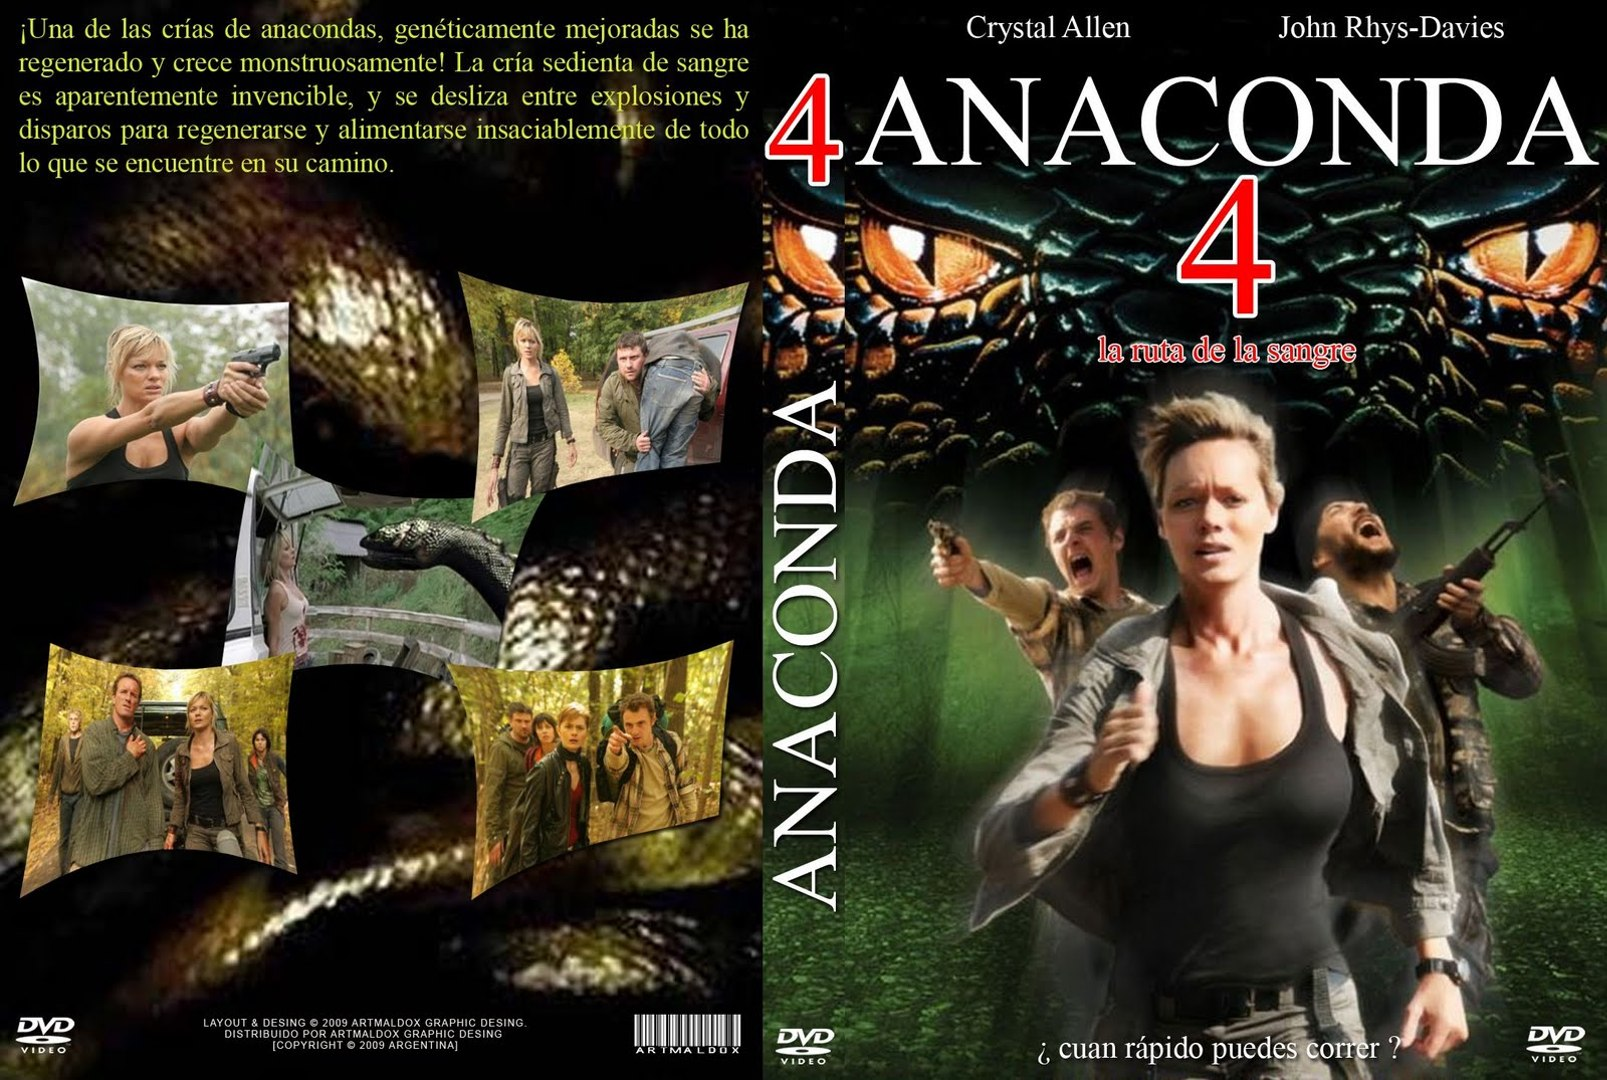 anaconda 4 trail of blood download